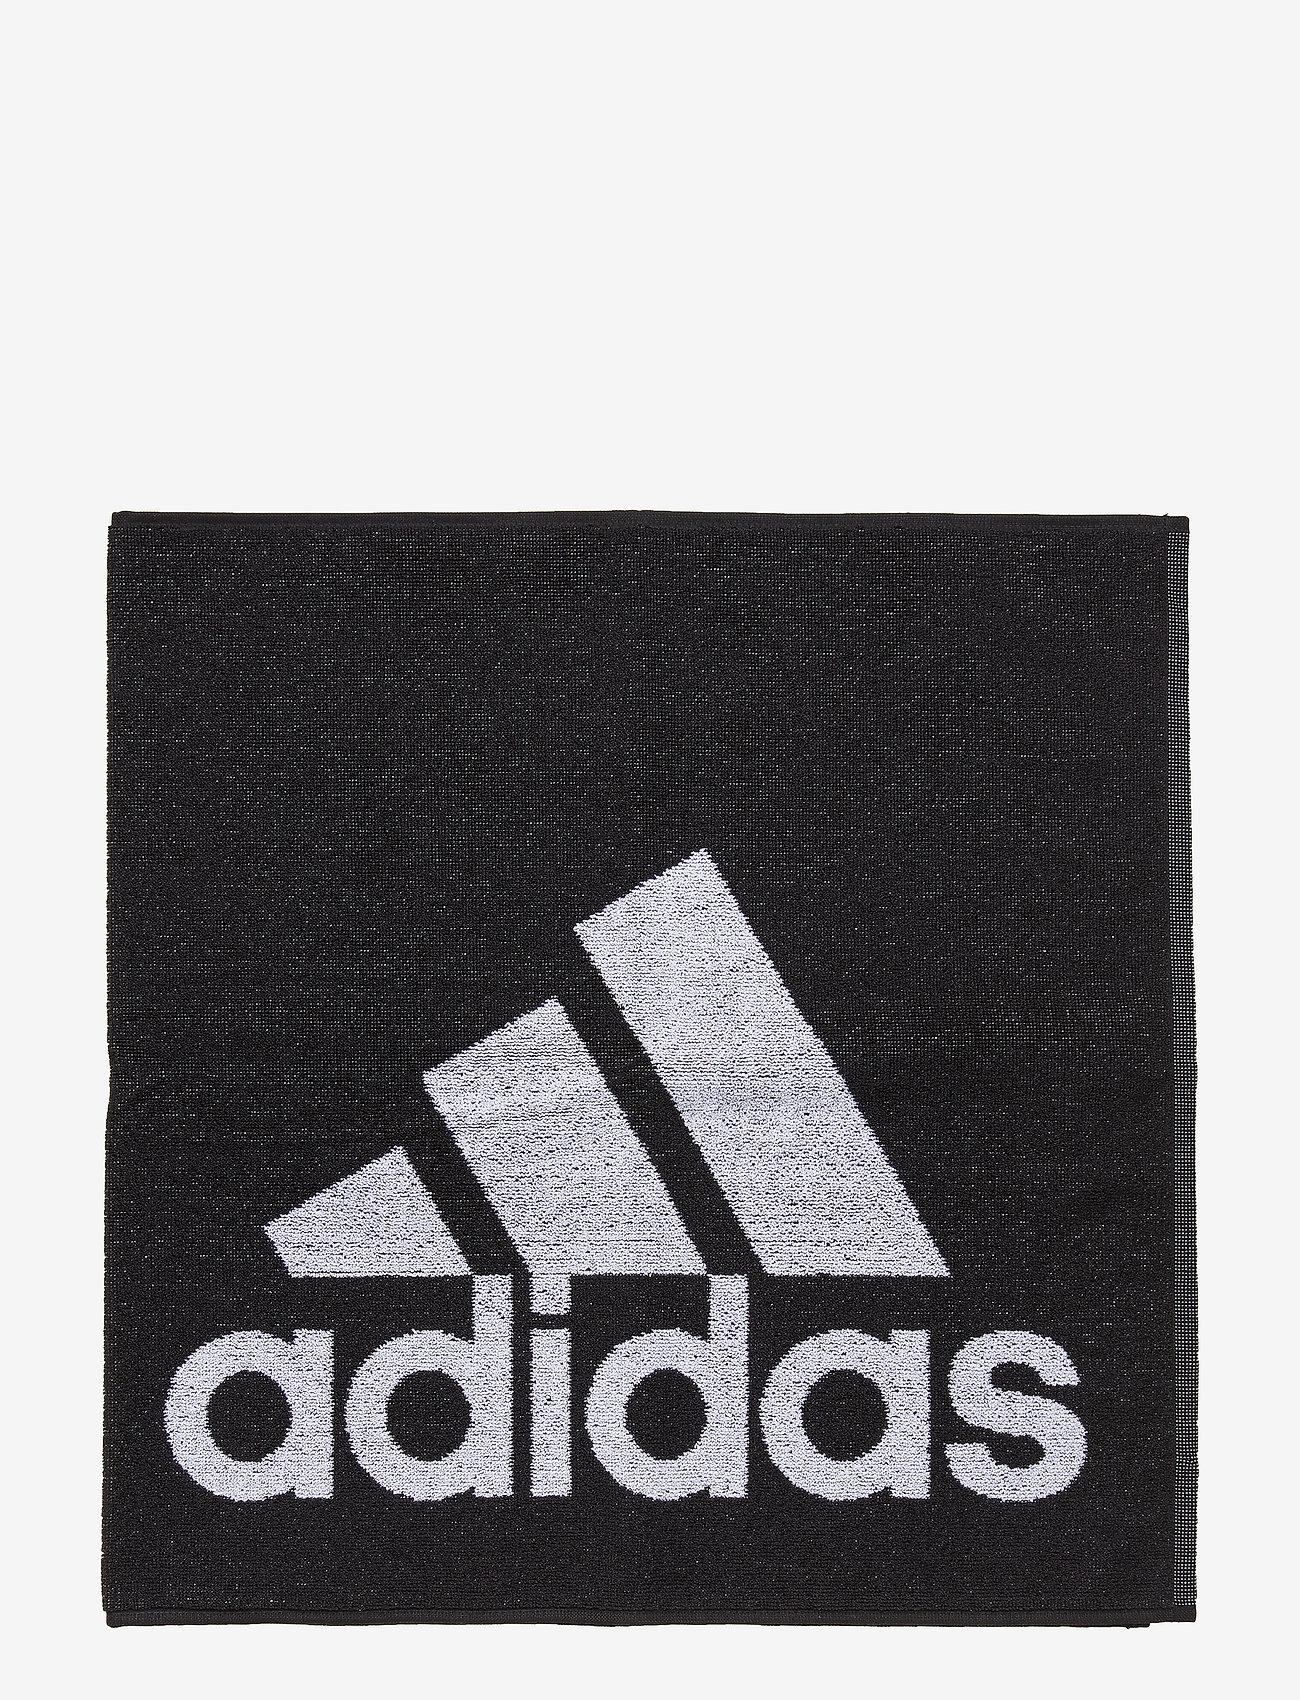 Adidas Towel S (Black/white) (159 kr) - adidas Performance